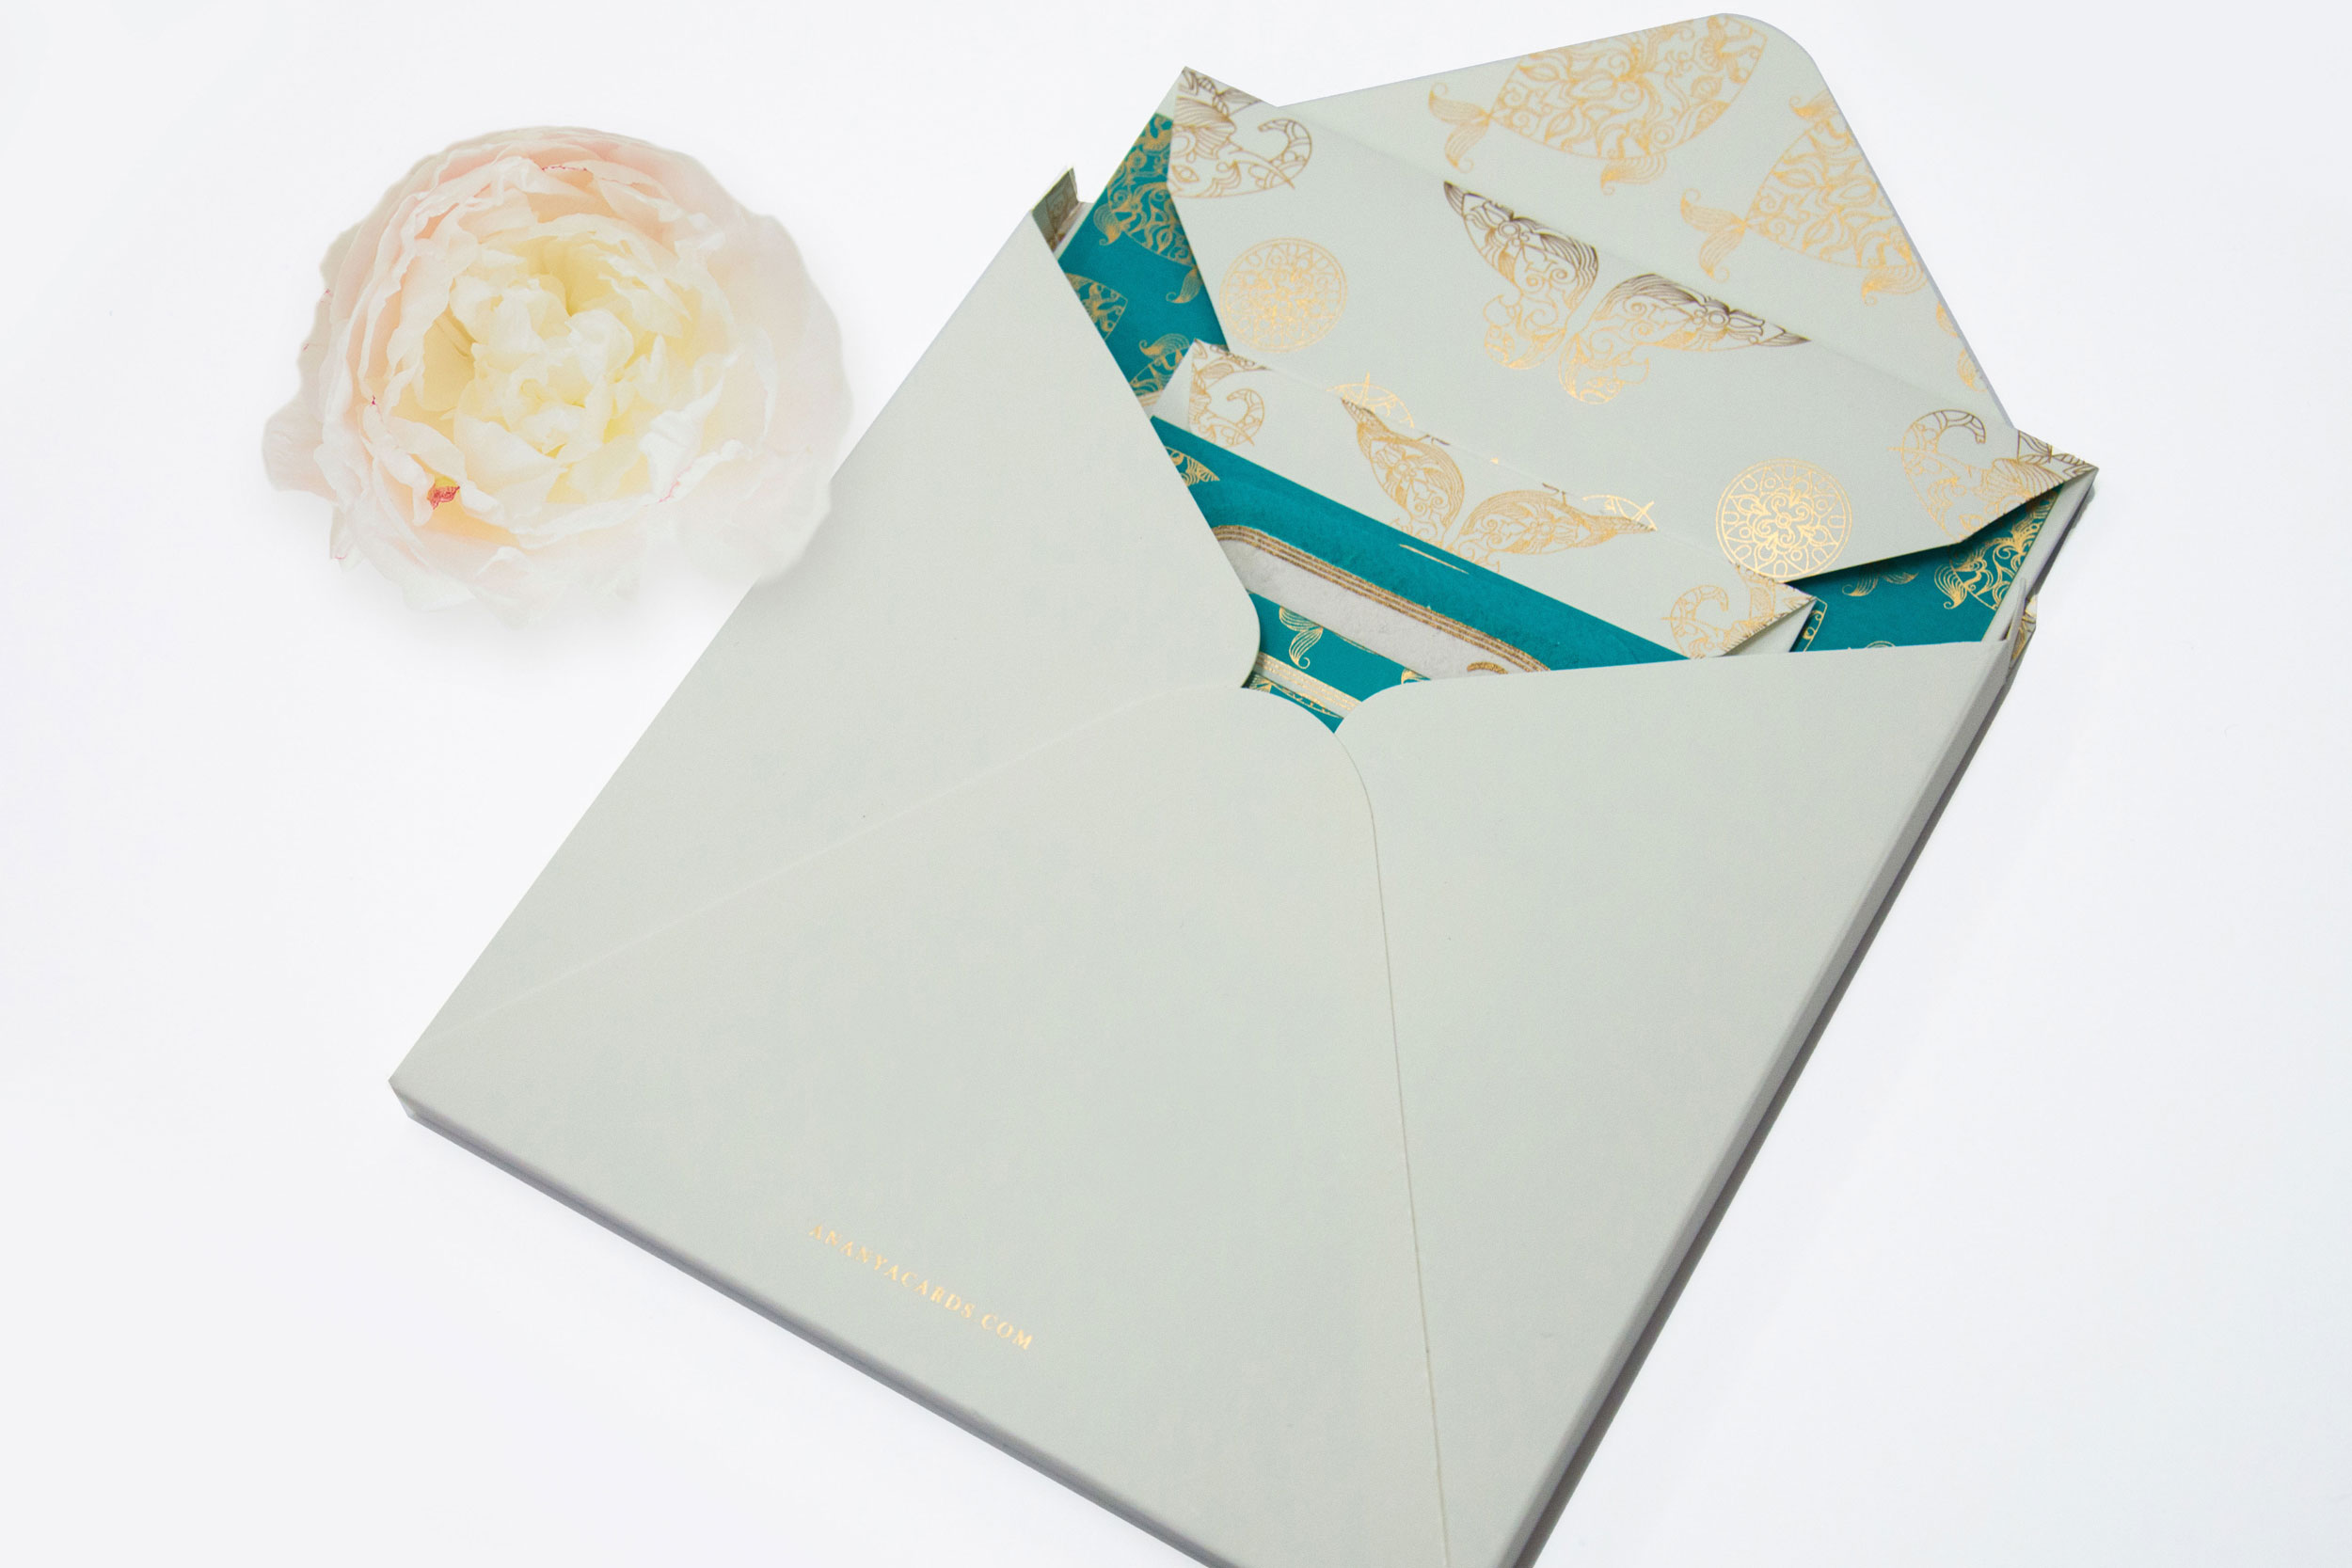 trio-of-life-blue-fish-envelope-wedding-invitation.jpg